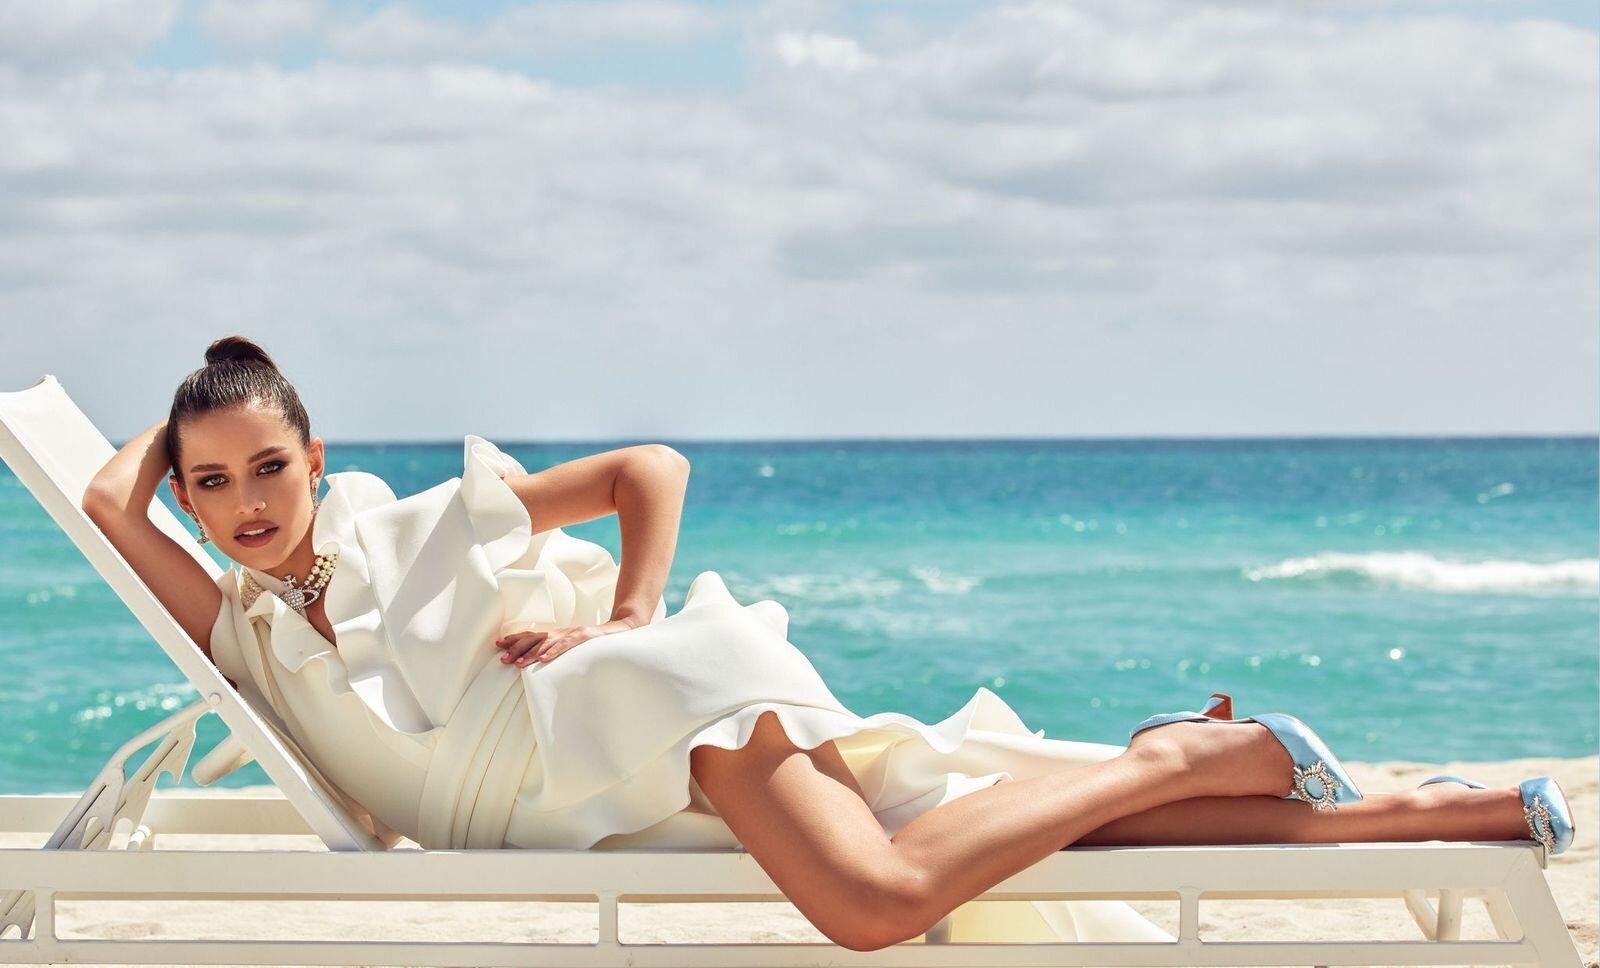 На берегу моря: История весенней digital-обложки Marie Claire-Фото 6